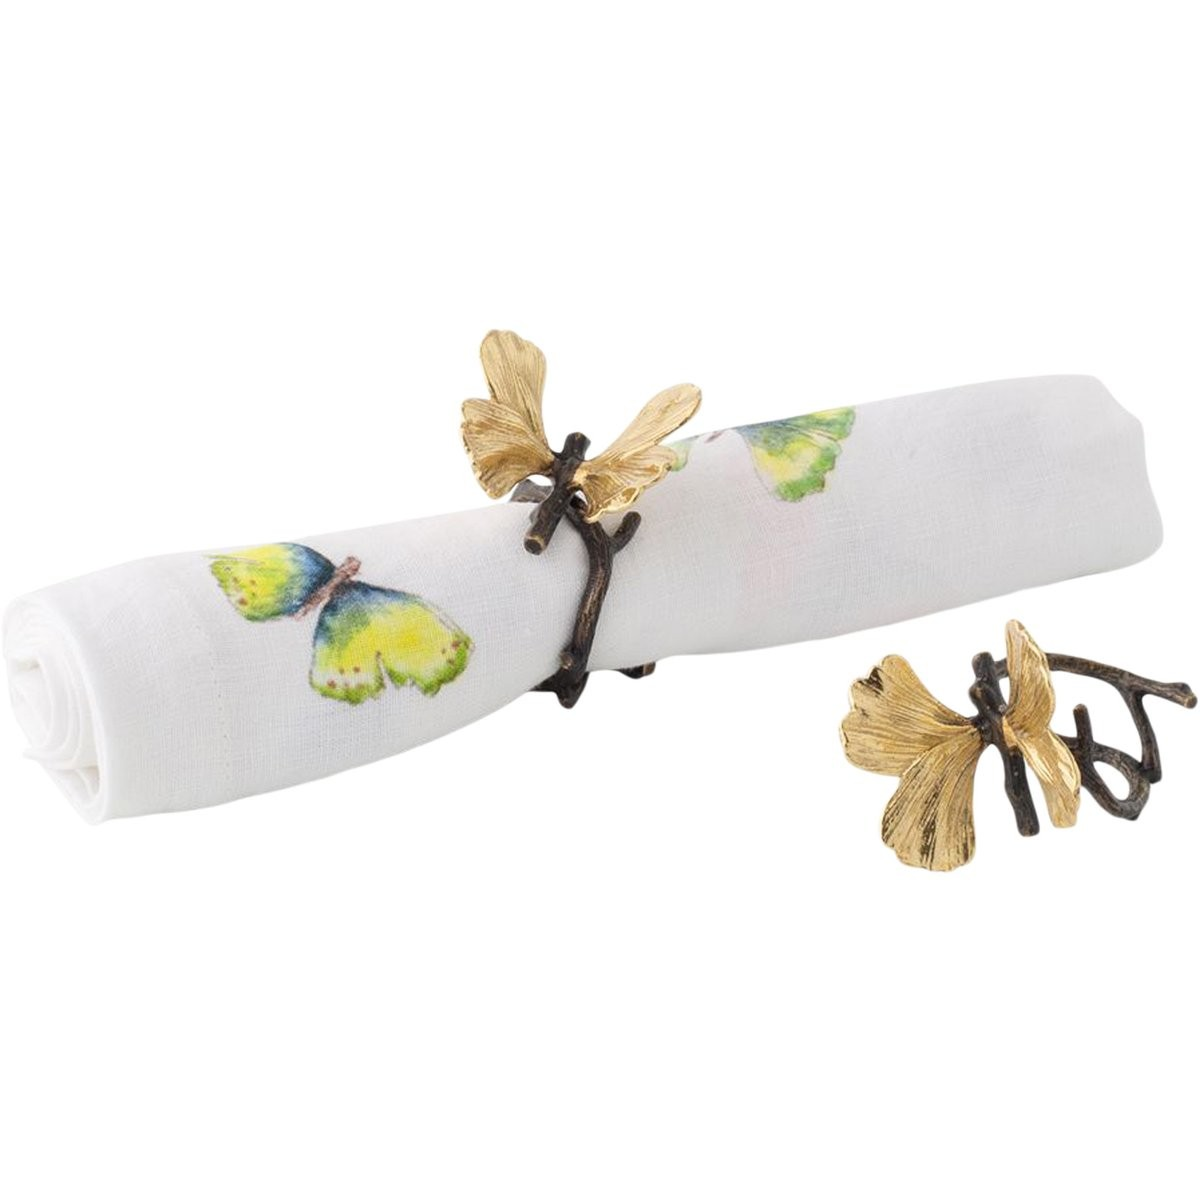 Michael Aram I Butterfly Ginkgo Set of 4 Napkin Rings